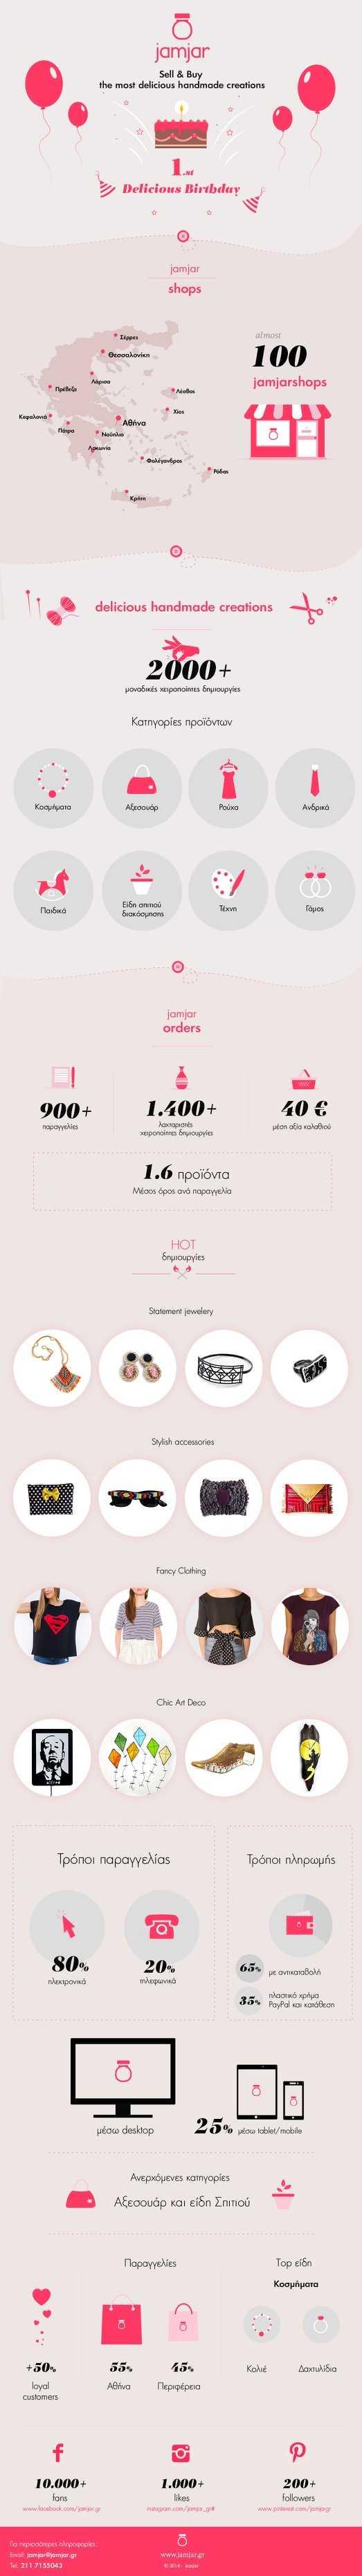 jamjar_1st birthday_infographic 2014_10_22